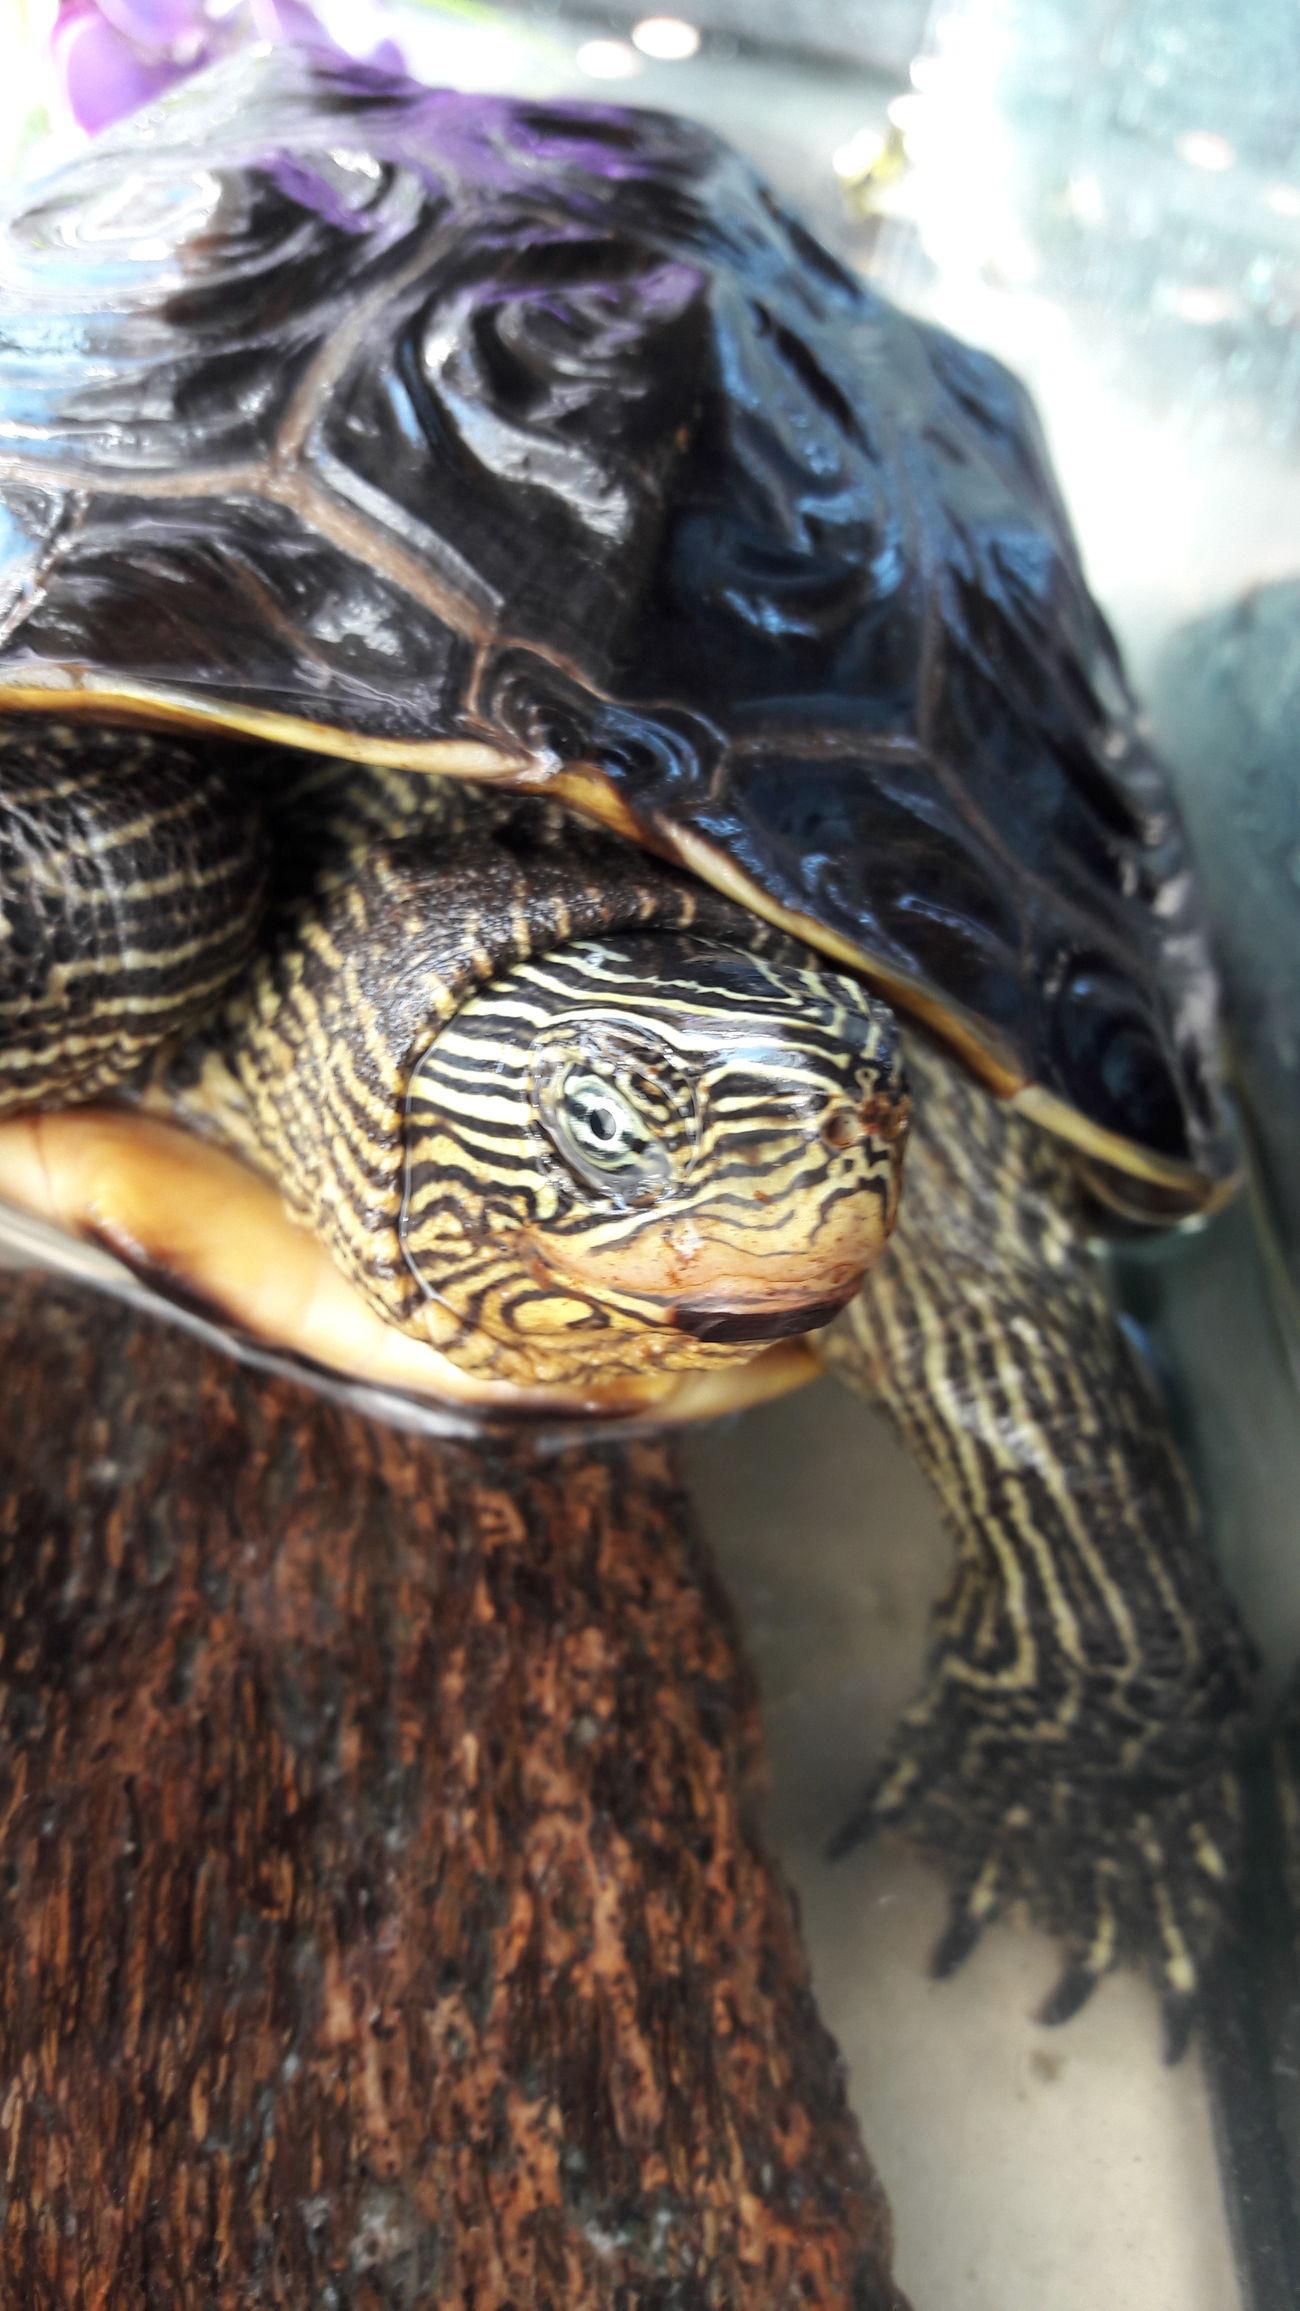 Animal Themes Tortuga Tortue Tortugas♡ Animals In The Wild Sea Turtle Animal Wildlife Animal Shell Tortoise Turtle